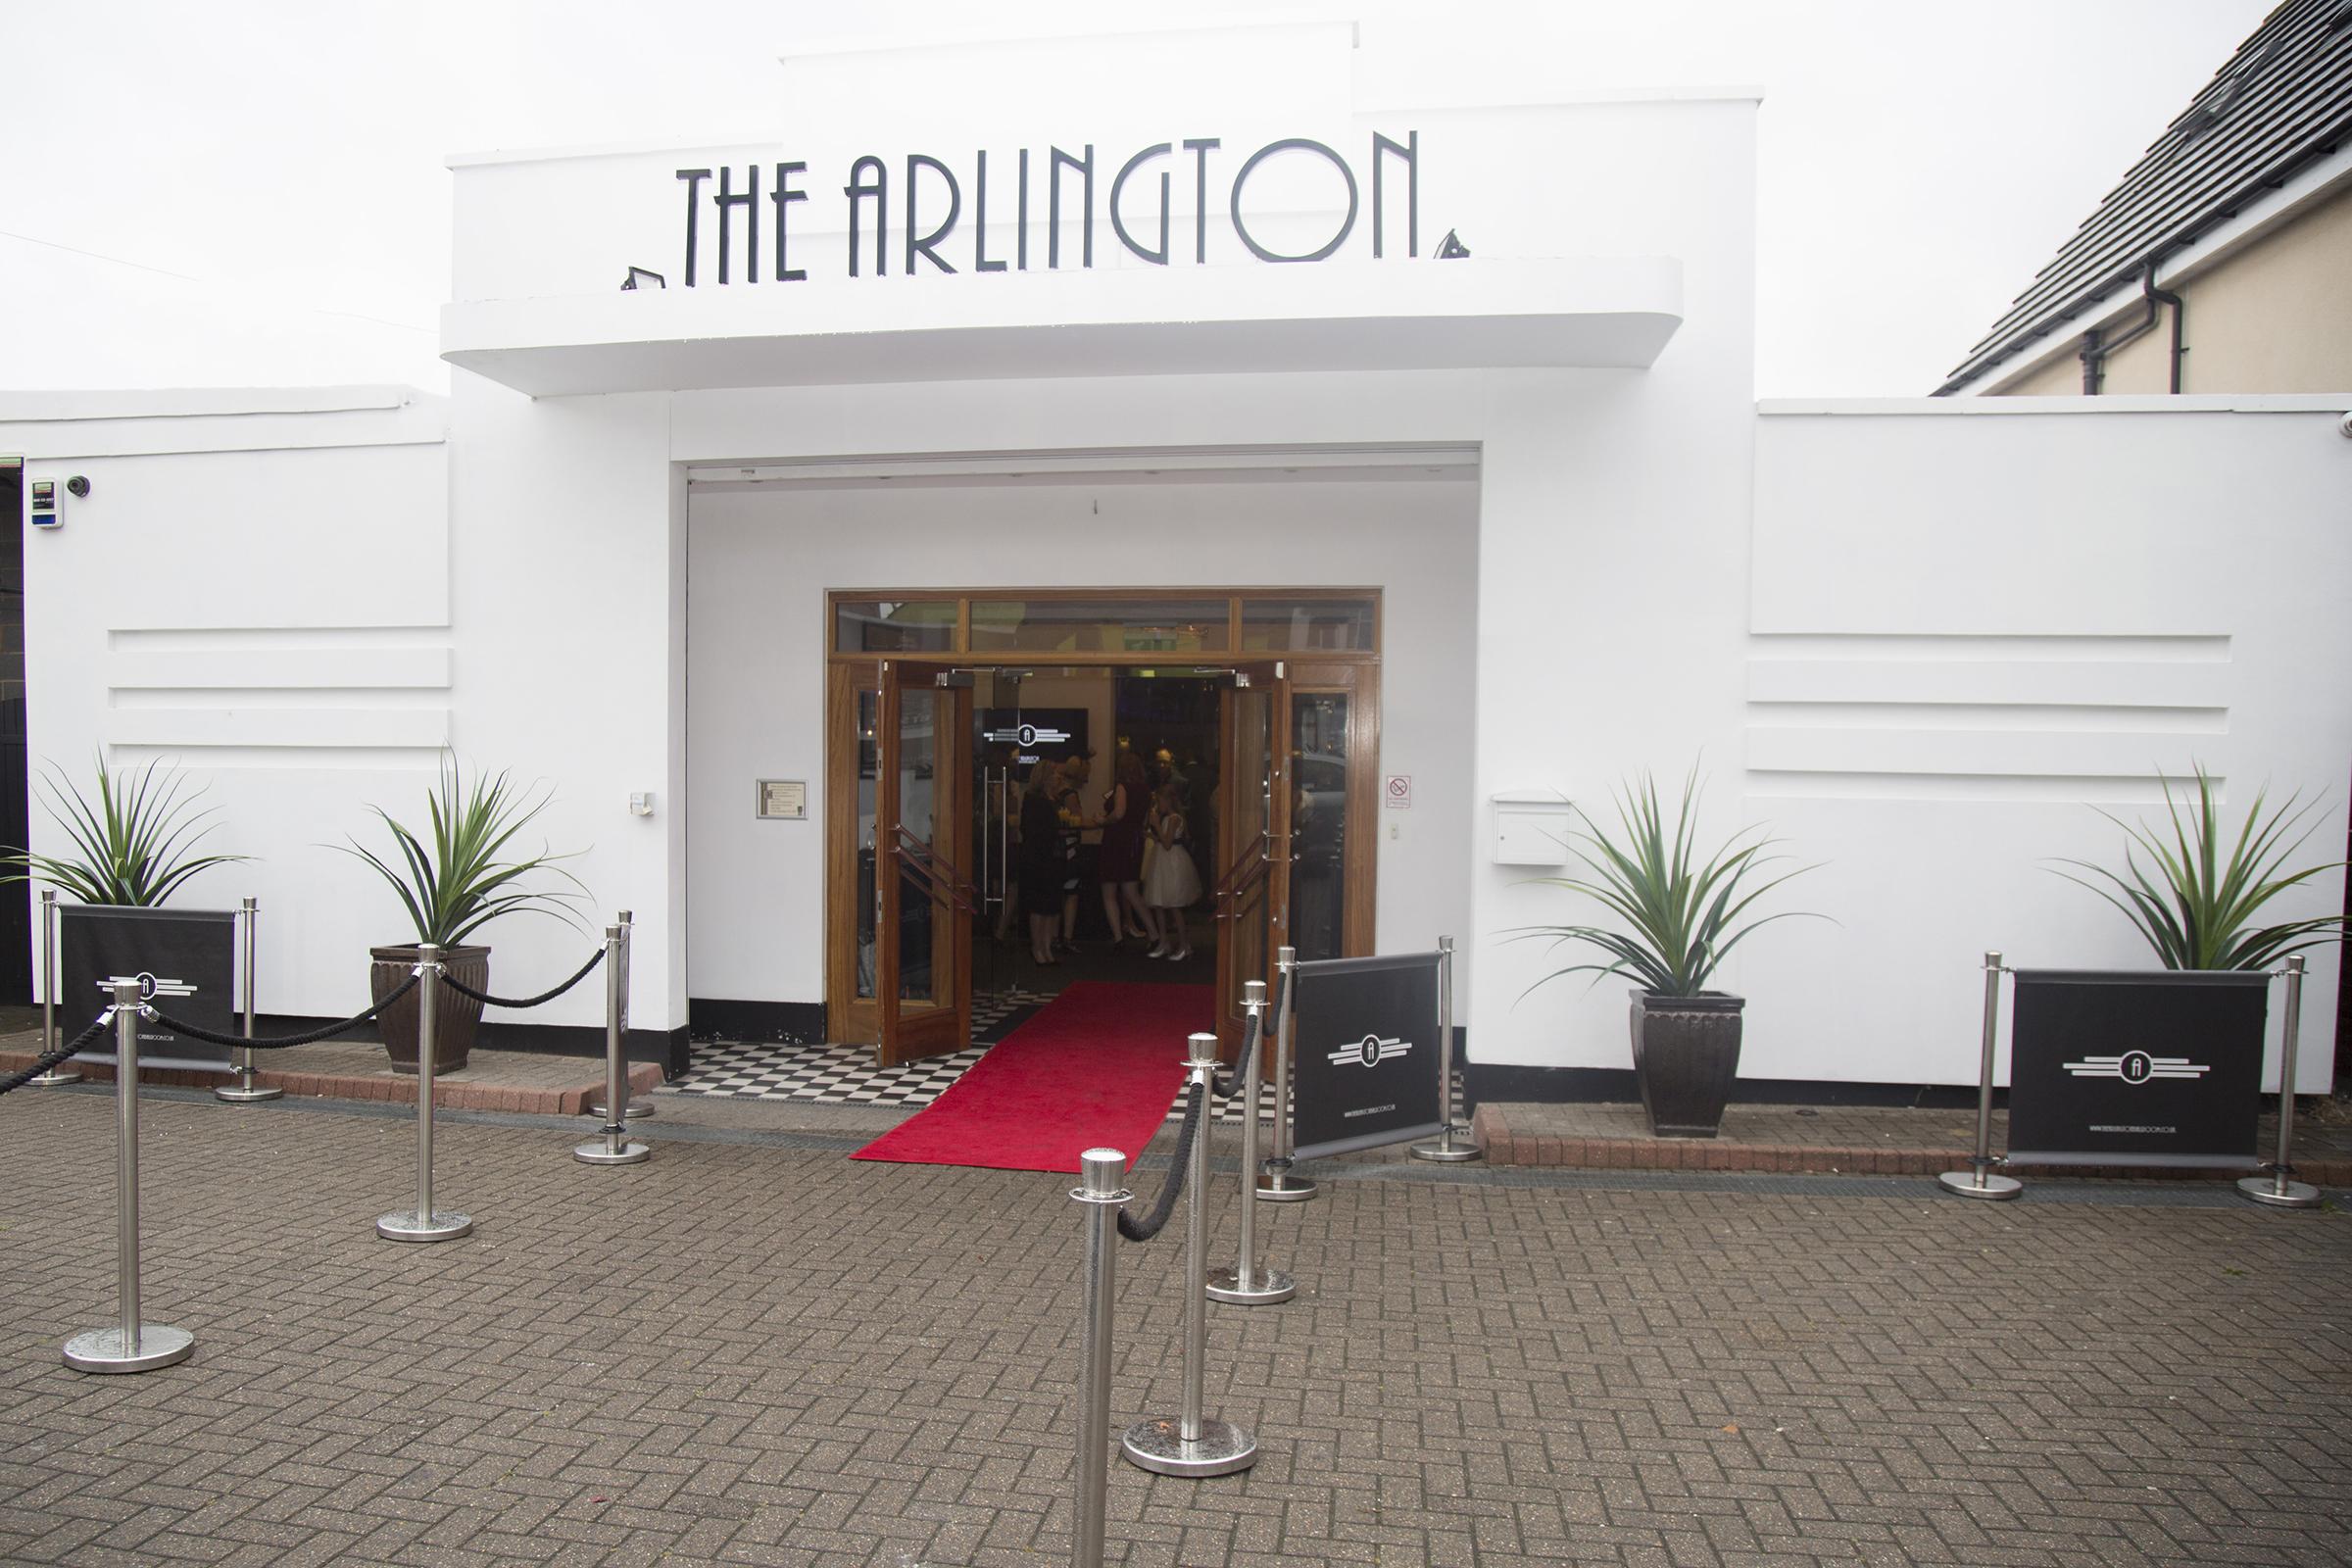 Arlington Ballroom Exterior Southend-on-Sea .jpg